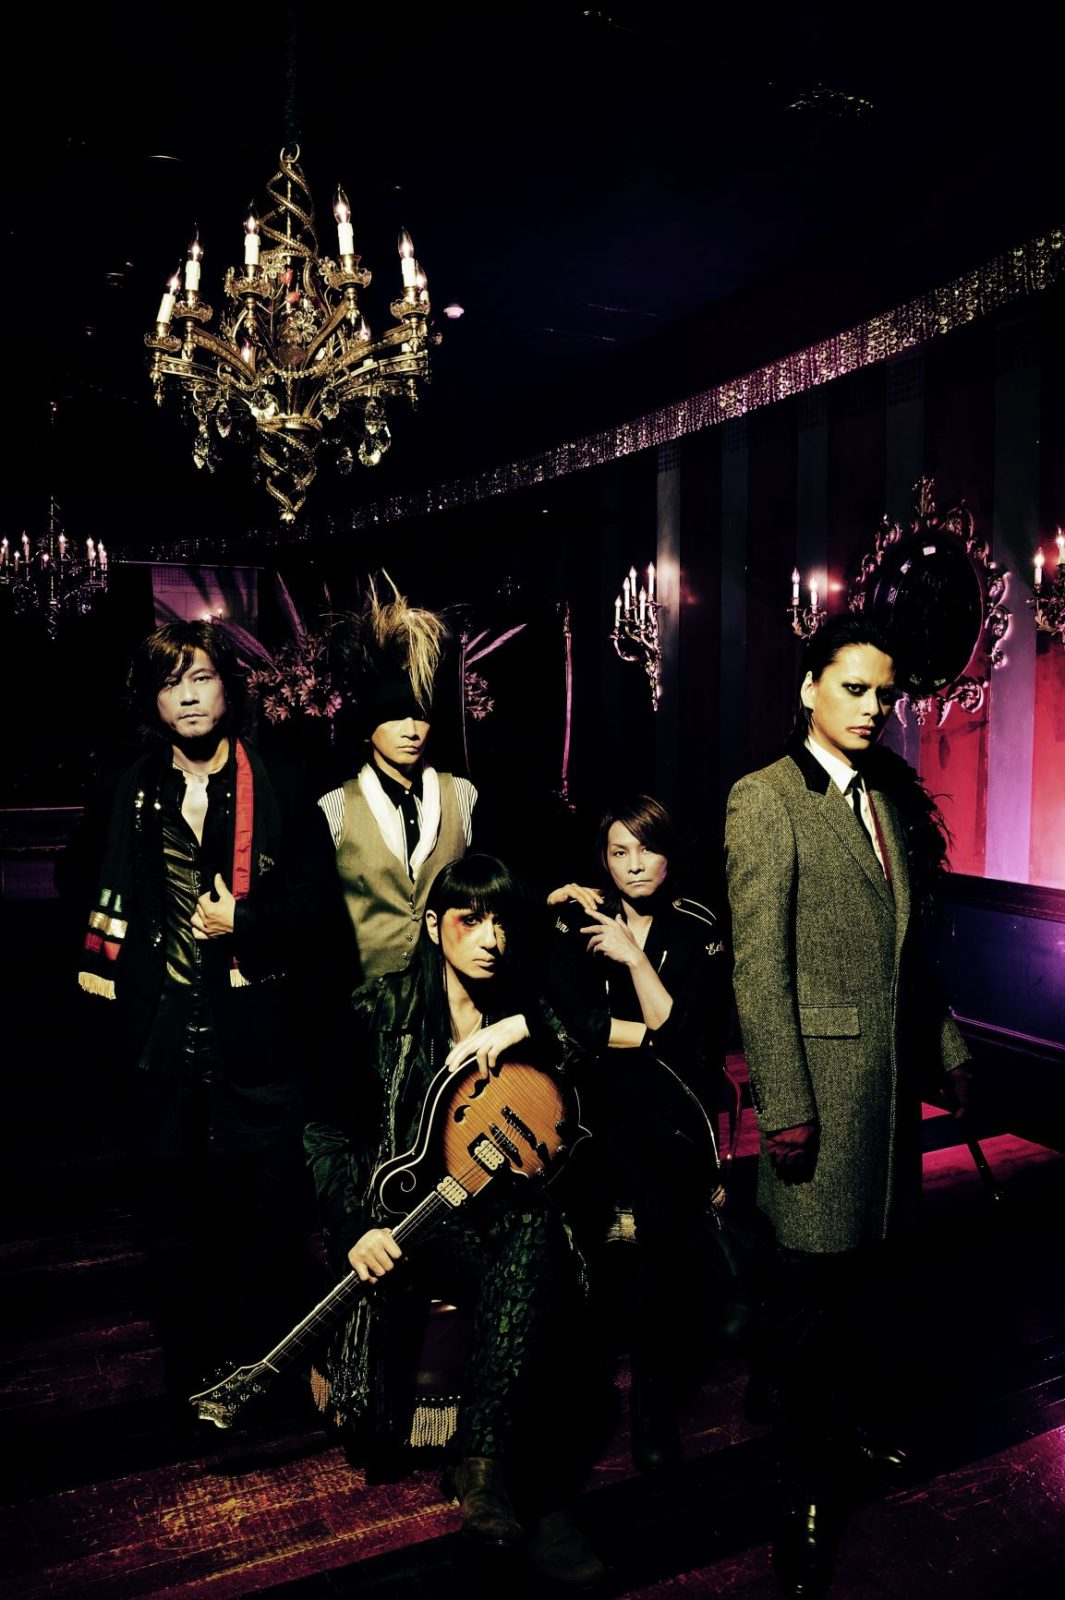 BUCK-TICK『B-T LIVE PRODUCT -Ariola YEARS-』10枚組Blu-ray Boxの全収録内容解禁サムネイル画像